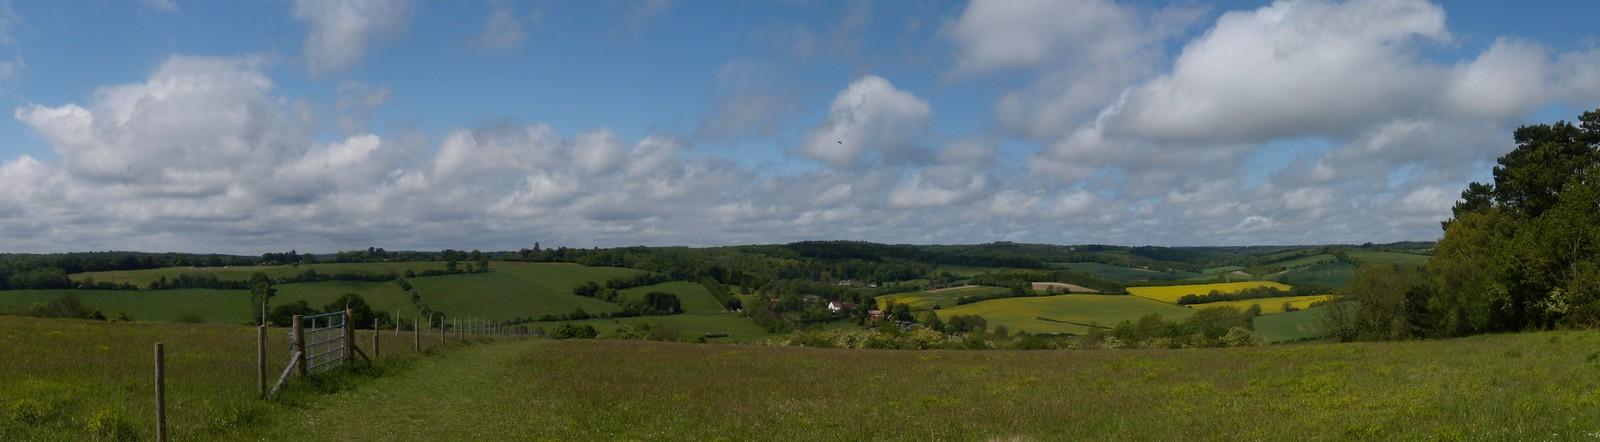 Panorama 1 - first 'view' Henley Circular via Stonor